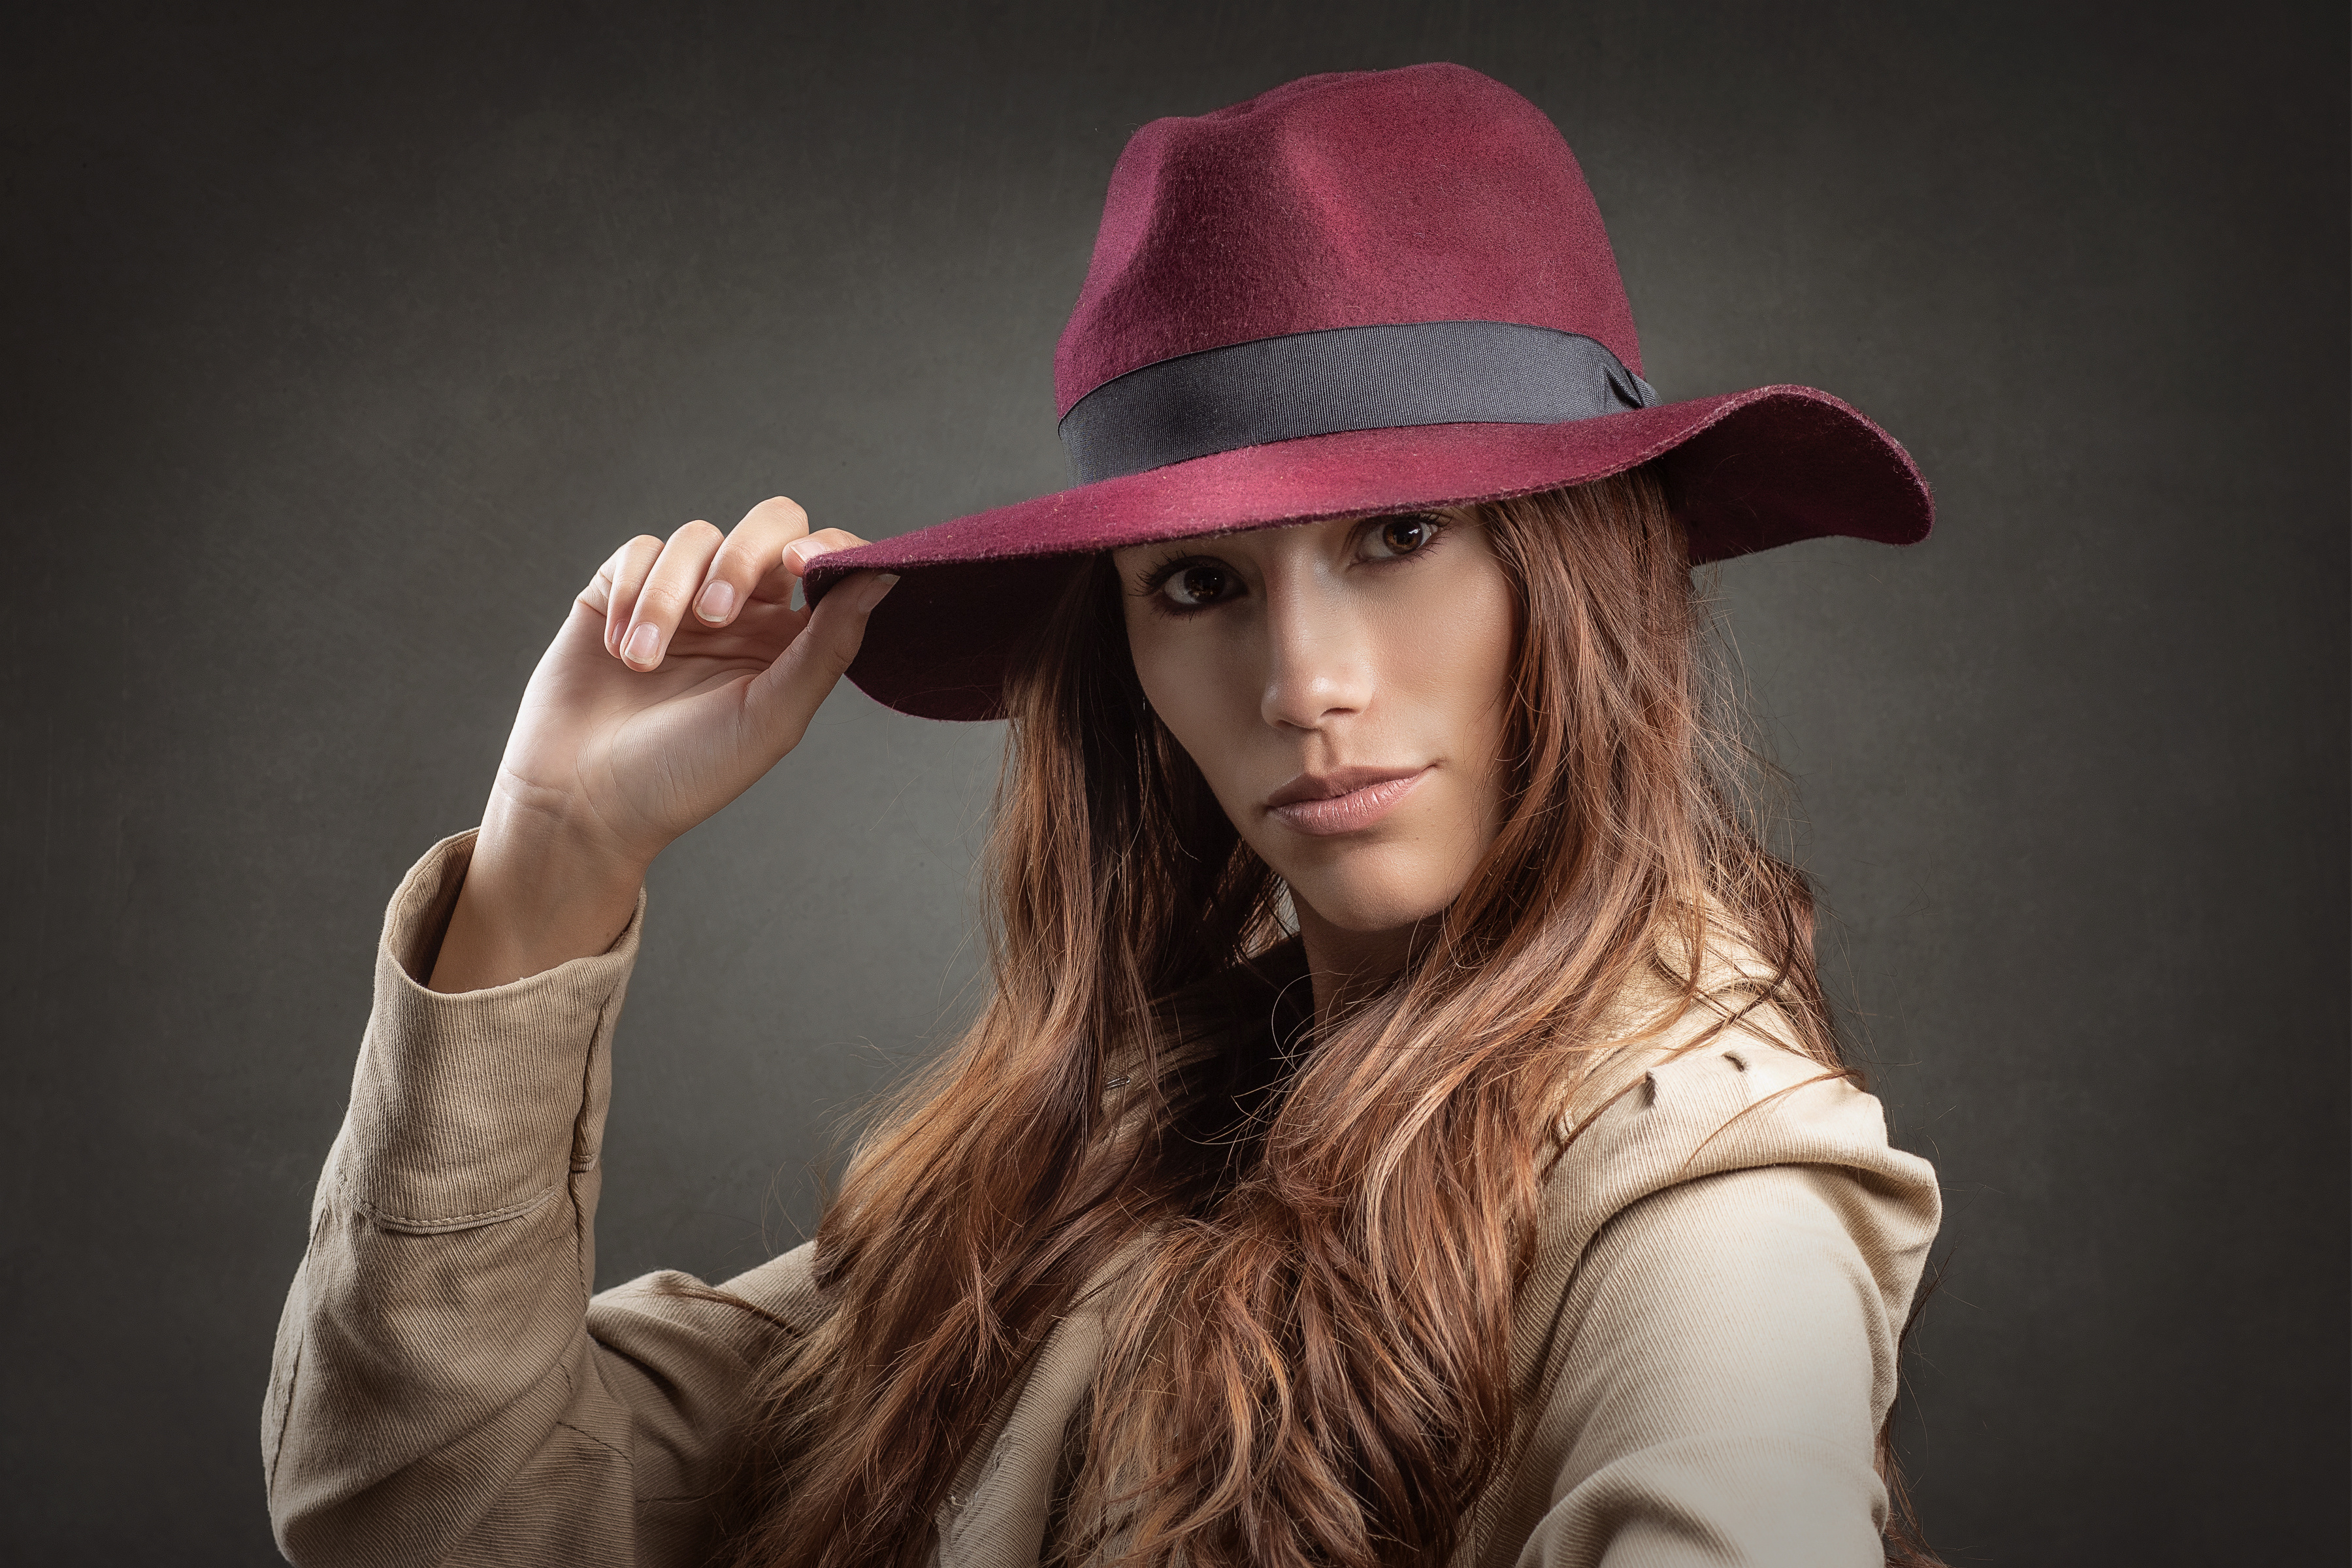 Brown Eyes Girl Hat Model Redhead Woman 3600x2400